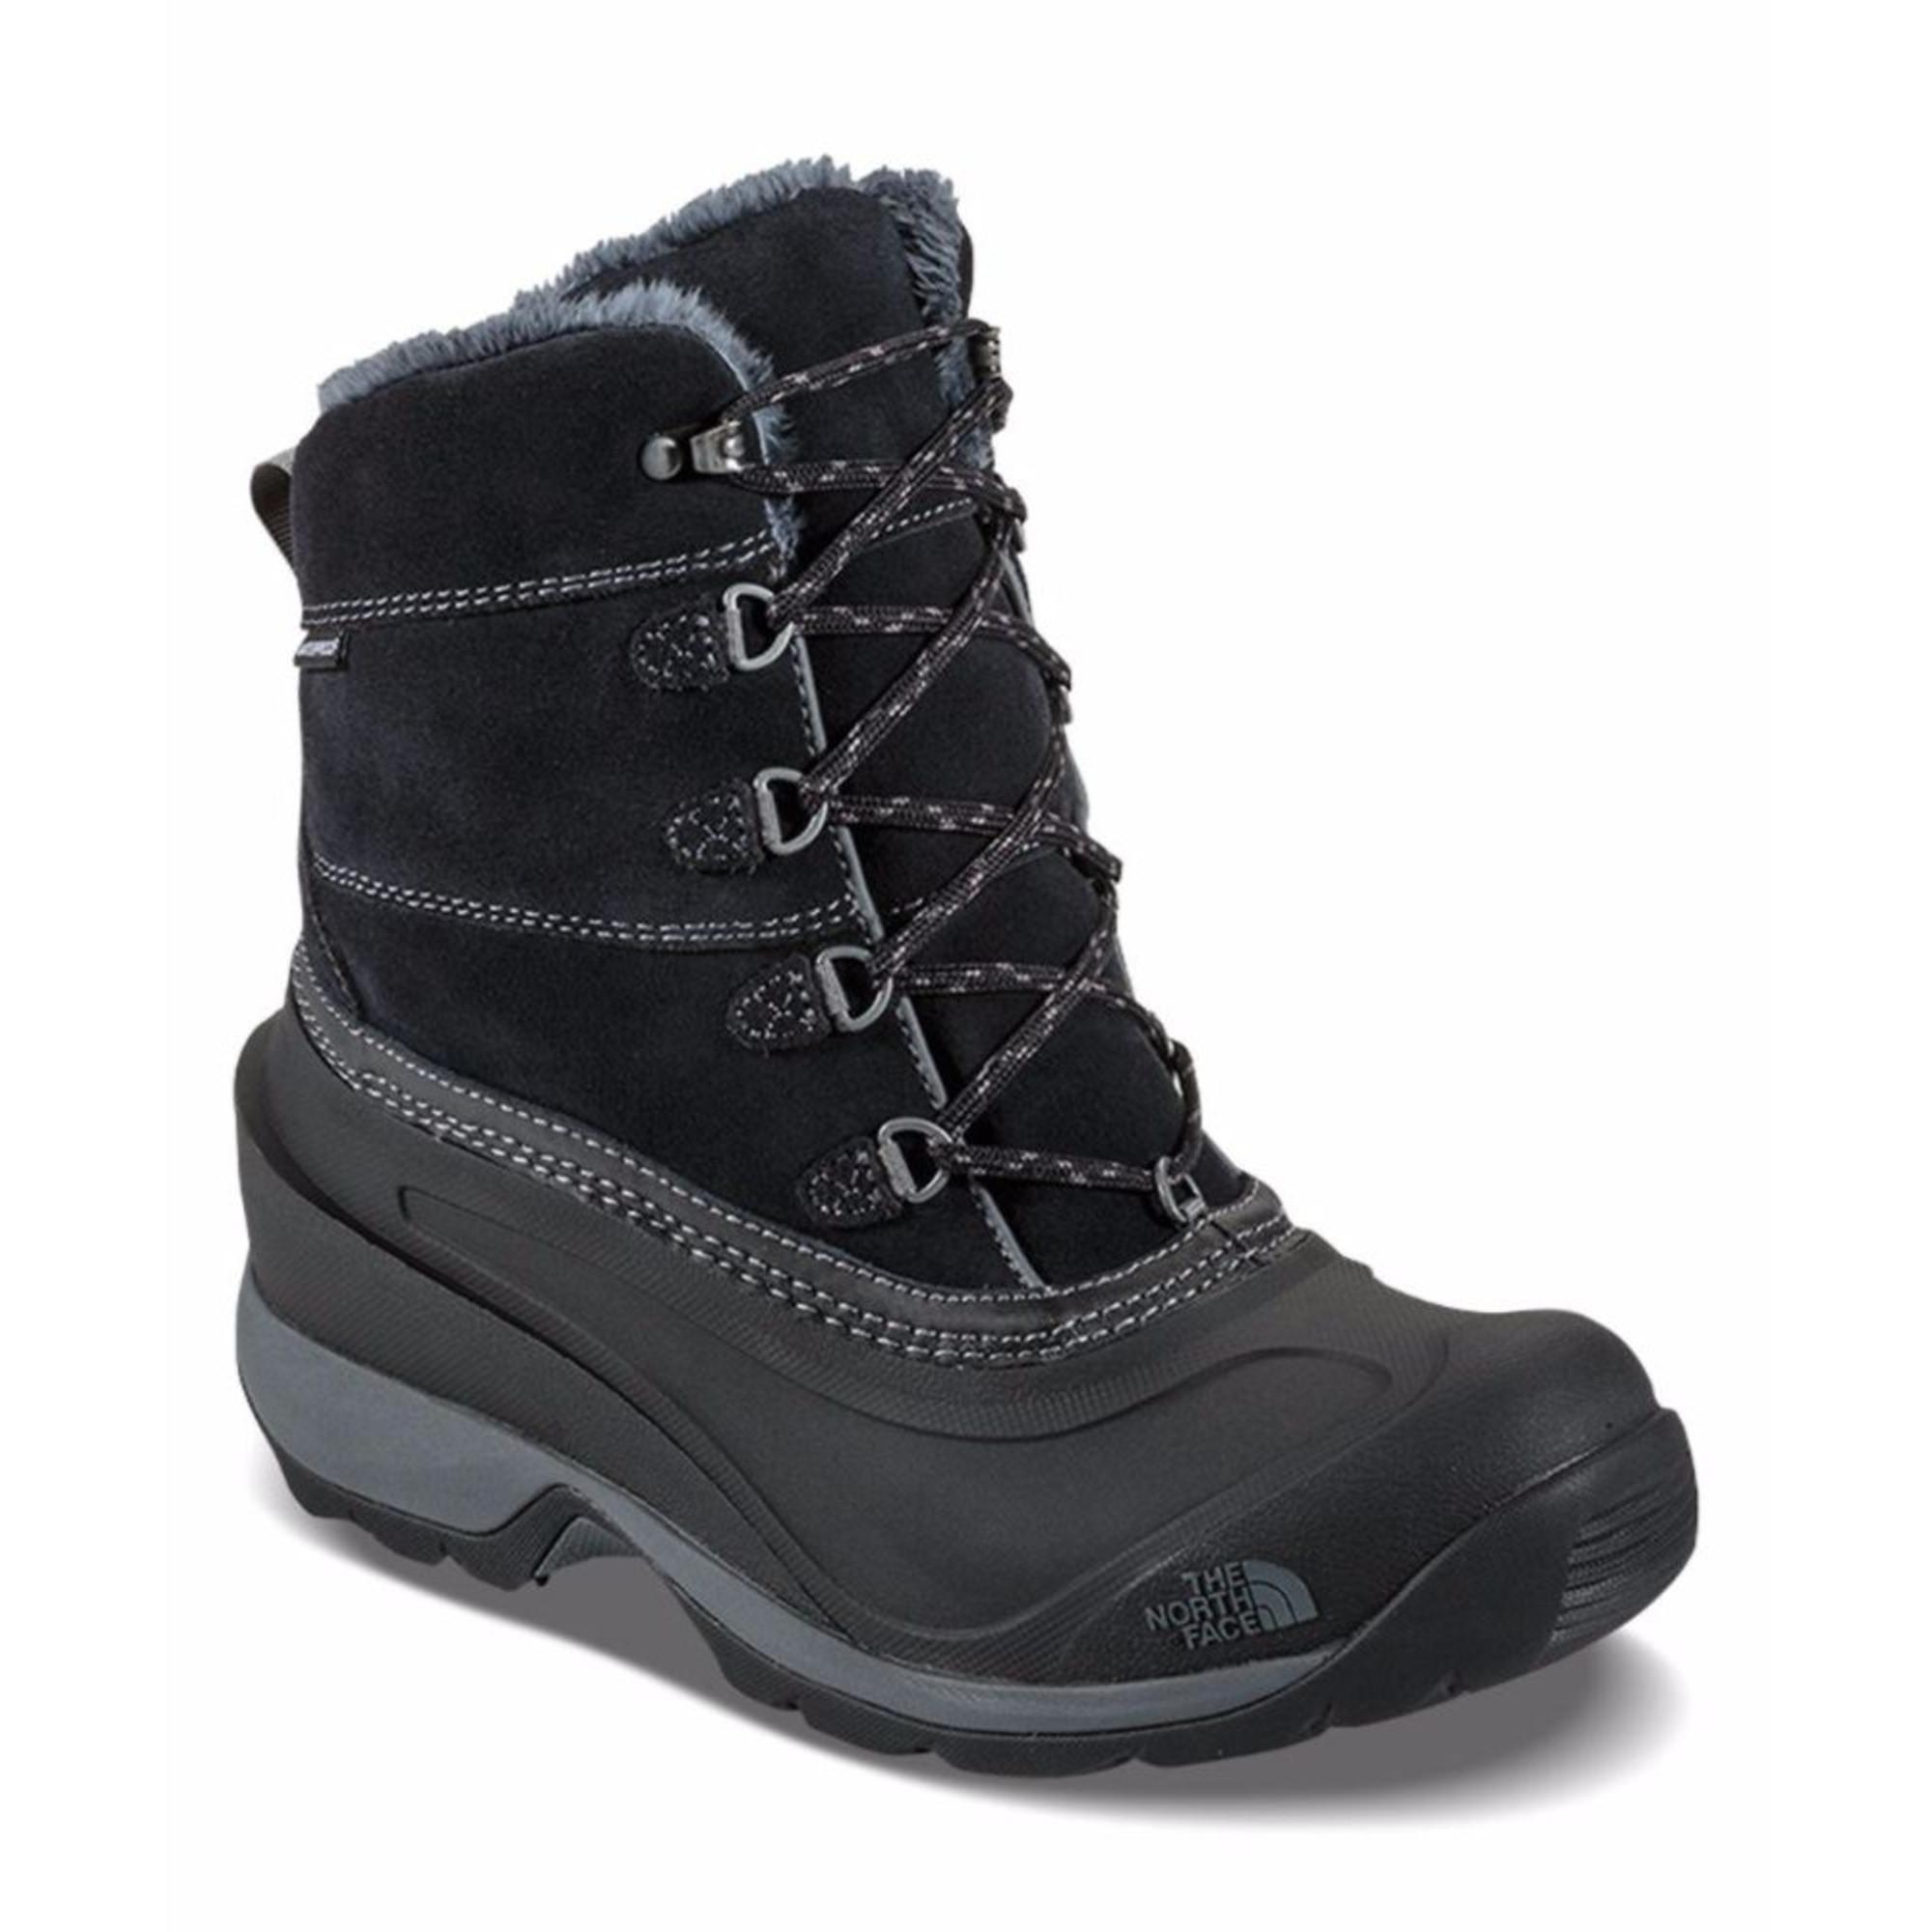 nowe niższe ceny buty jesienne całkowicie stylowy The North Face Women's Chilkat III Boot